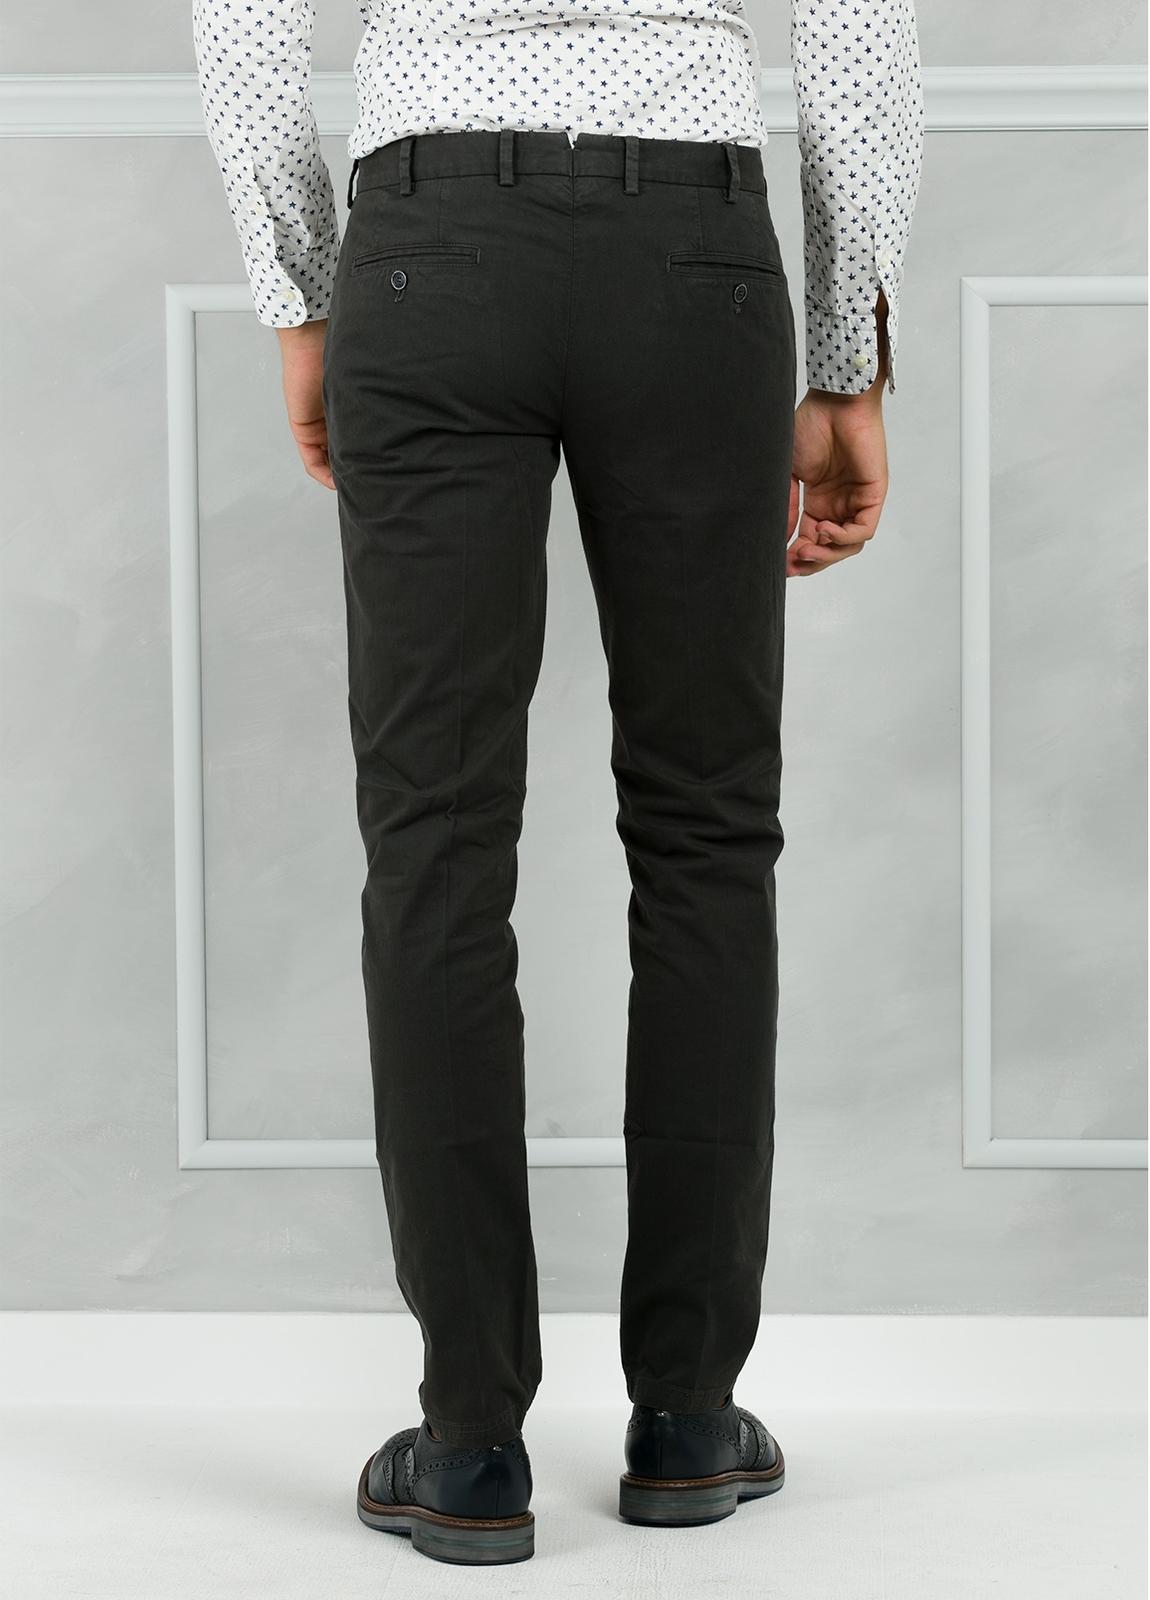 Pantalón chino modelo SANTA color gris. 98% Algodón 2% Elastán. - Ítem3